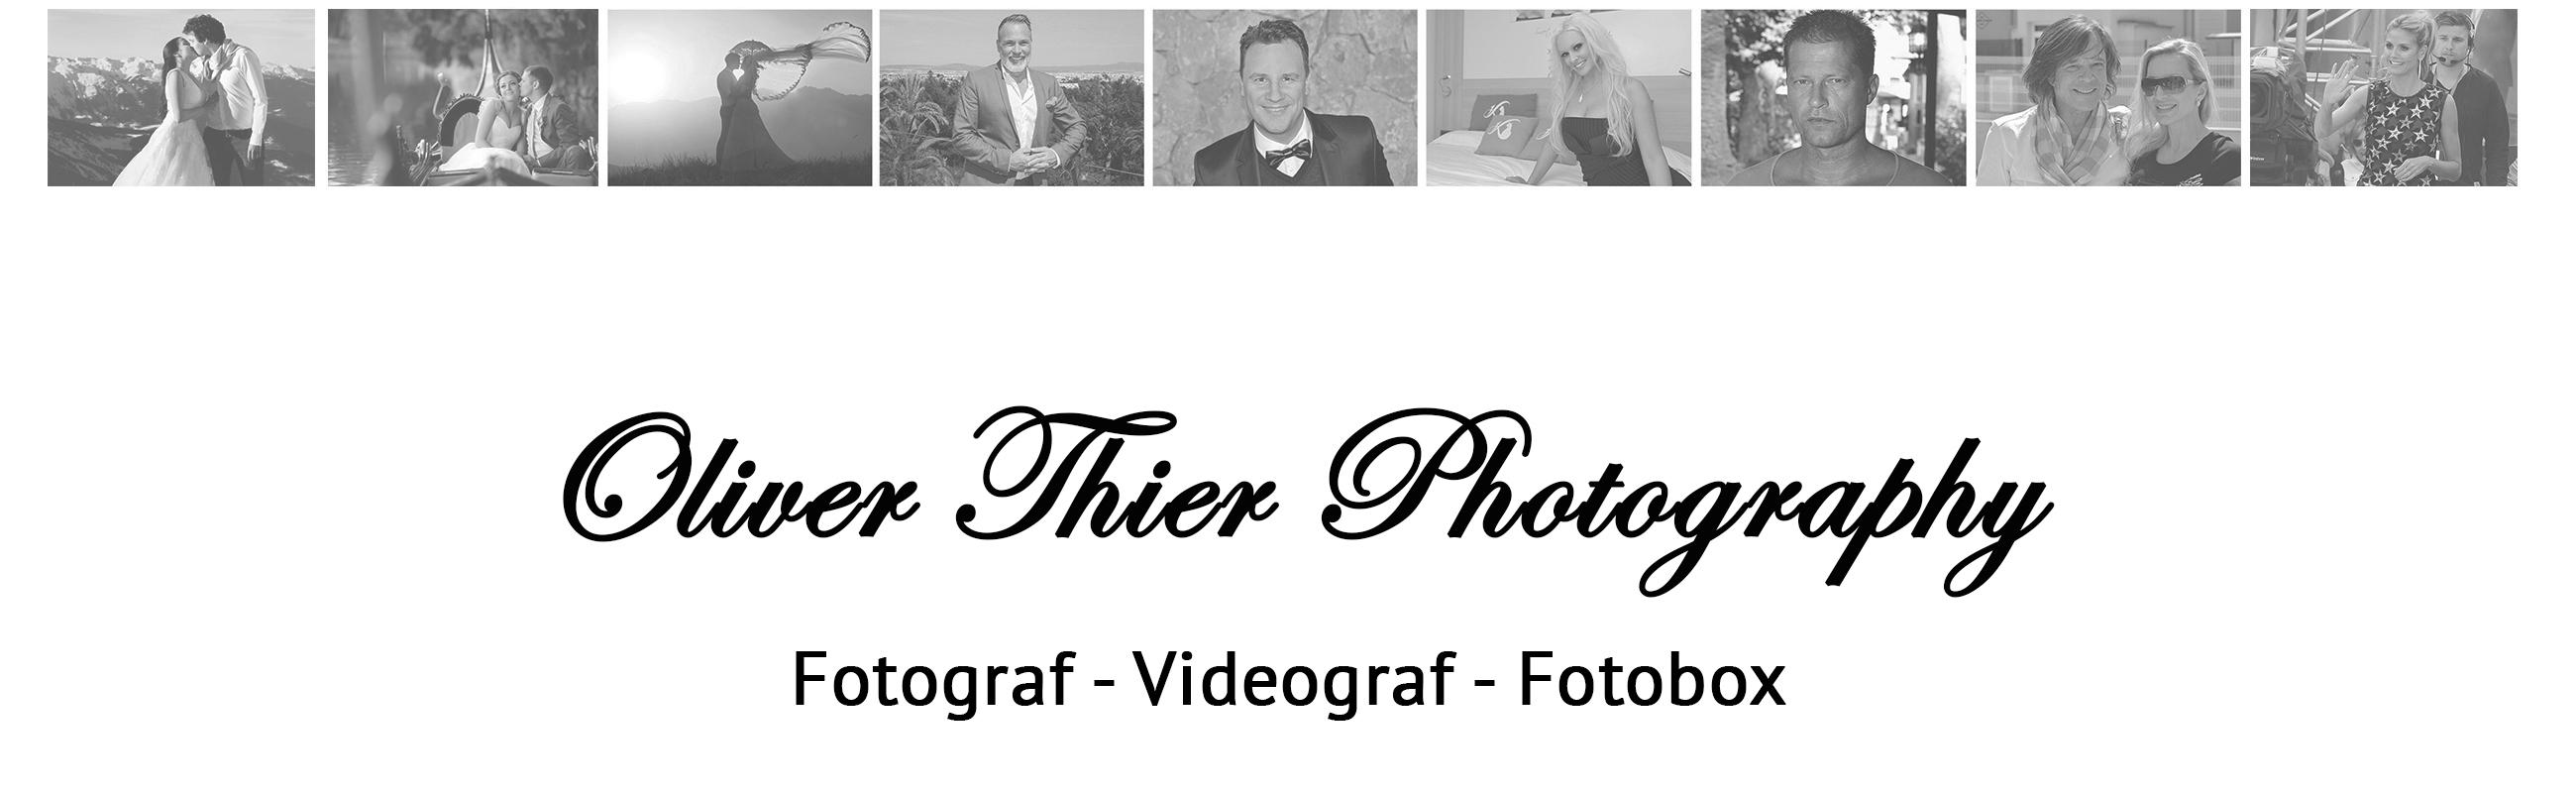 Fotograf Hochzeitsfotograf Oliver Thier Photography